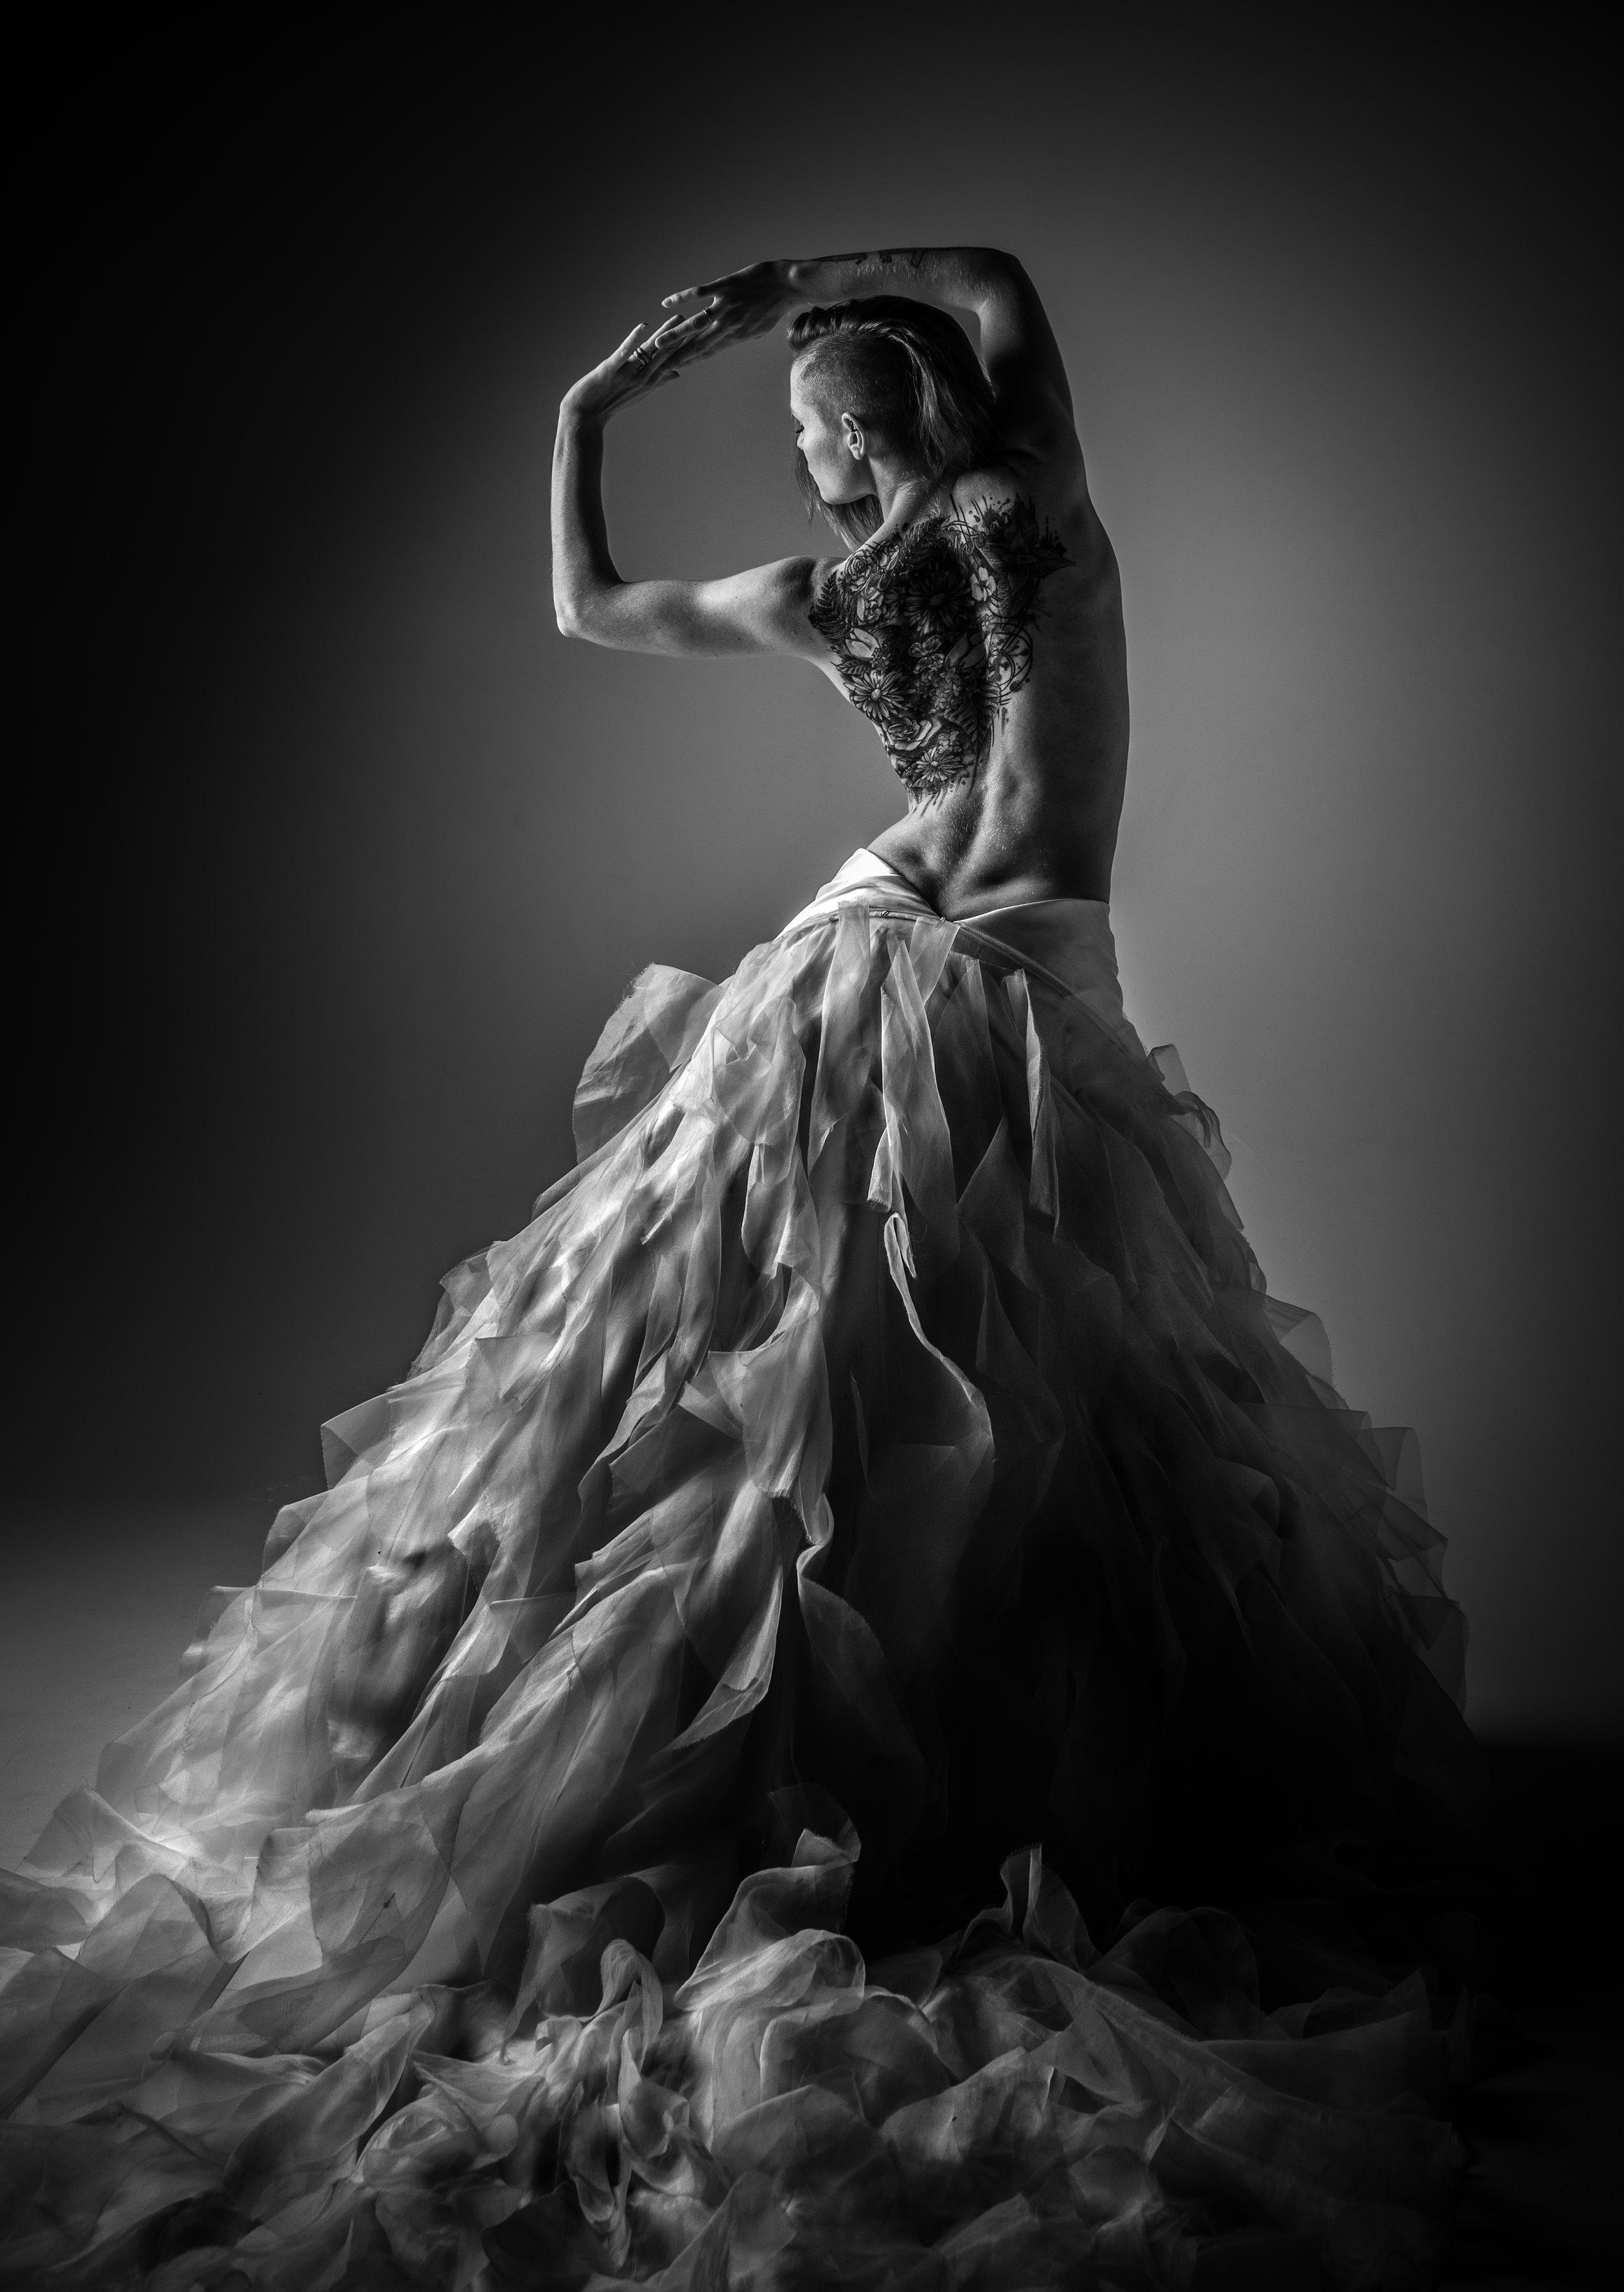 Tom_Lupton_Photography_Portraits_Wedding_Gown.jpg